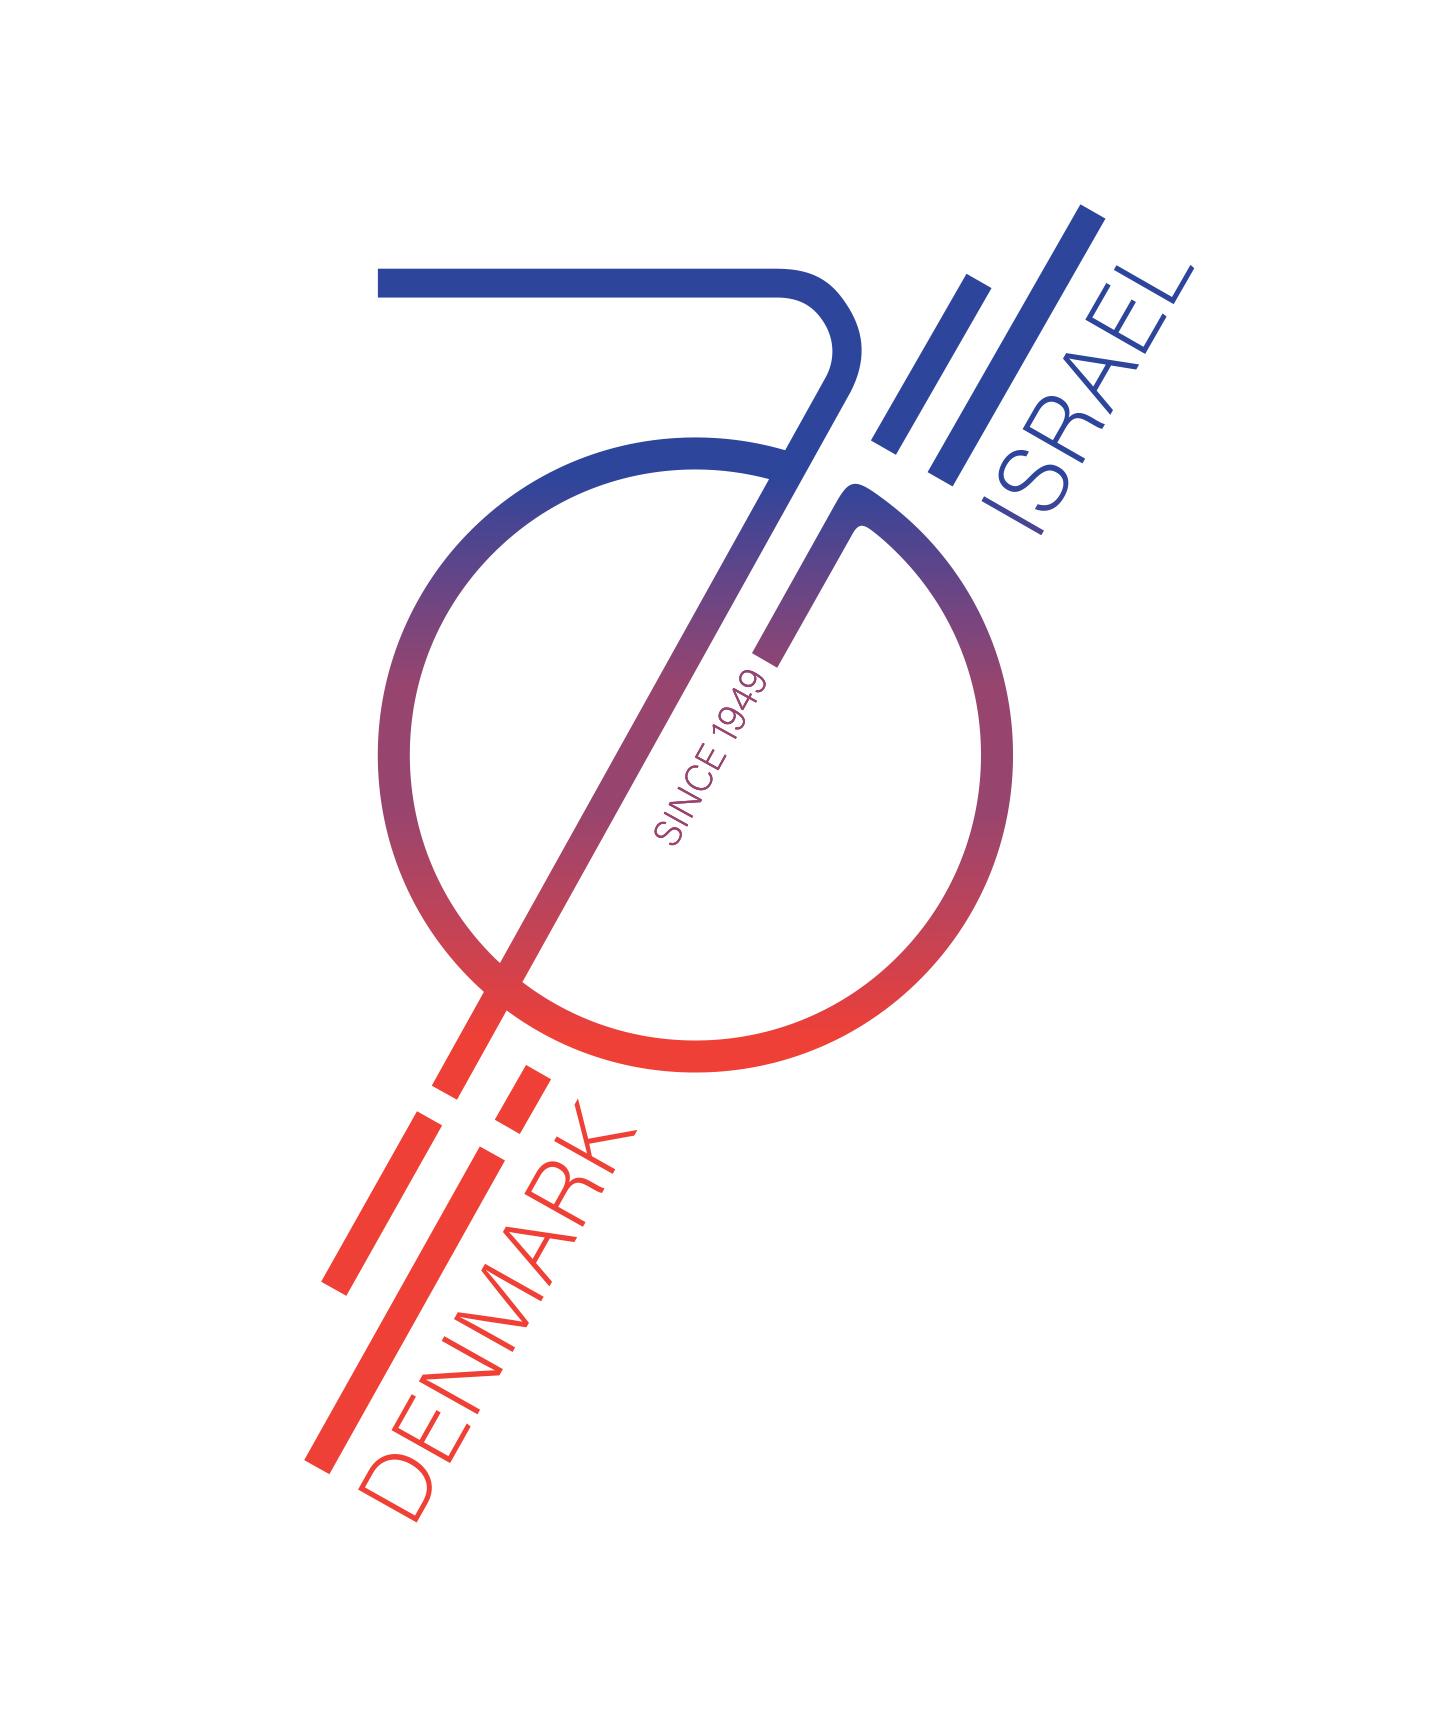 70th Anniversary logo for the danish - IsraEli Embassy - Case: Logodesign competition – Winner 2019